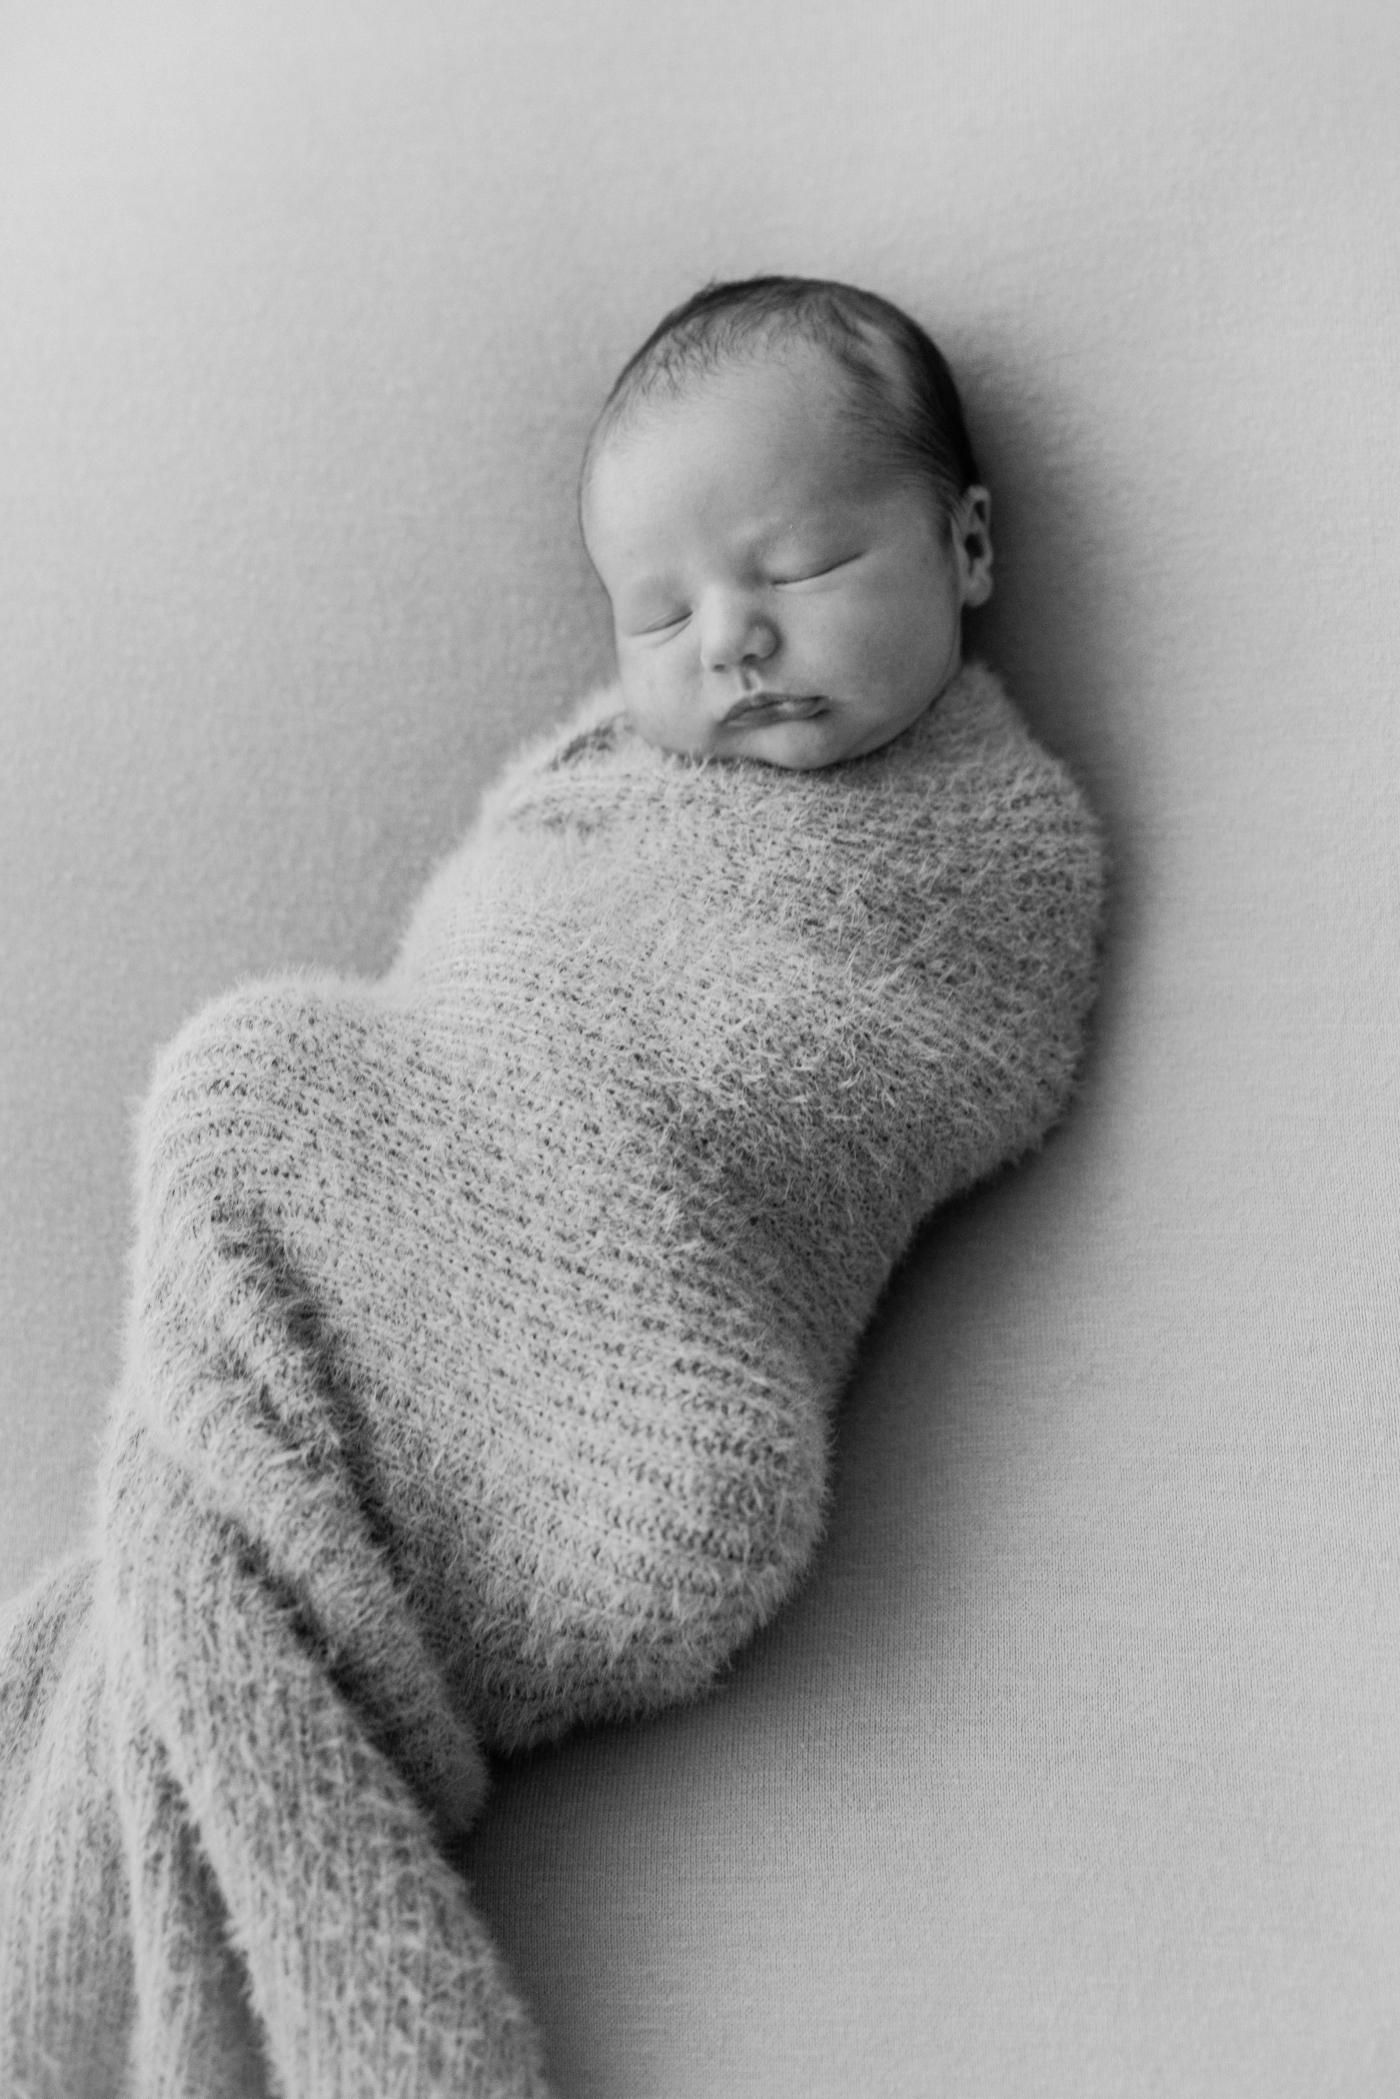 Baby Flynn - Natural Newborn Photography in Adelaide - Simple and Beautiful Newborn Photography - Katherine Schultz - Natural Light Newborn Photographer in Adelaide - www.katherineschultzphotography.com_0012.jpg